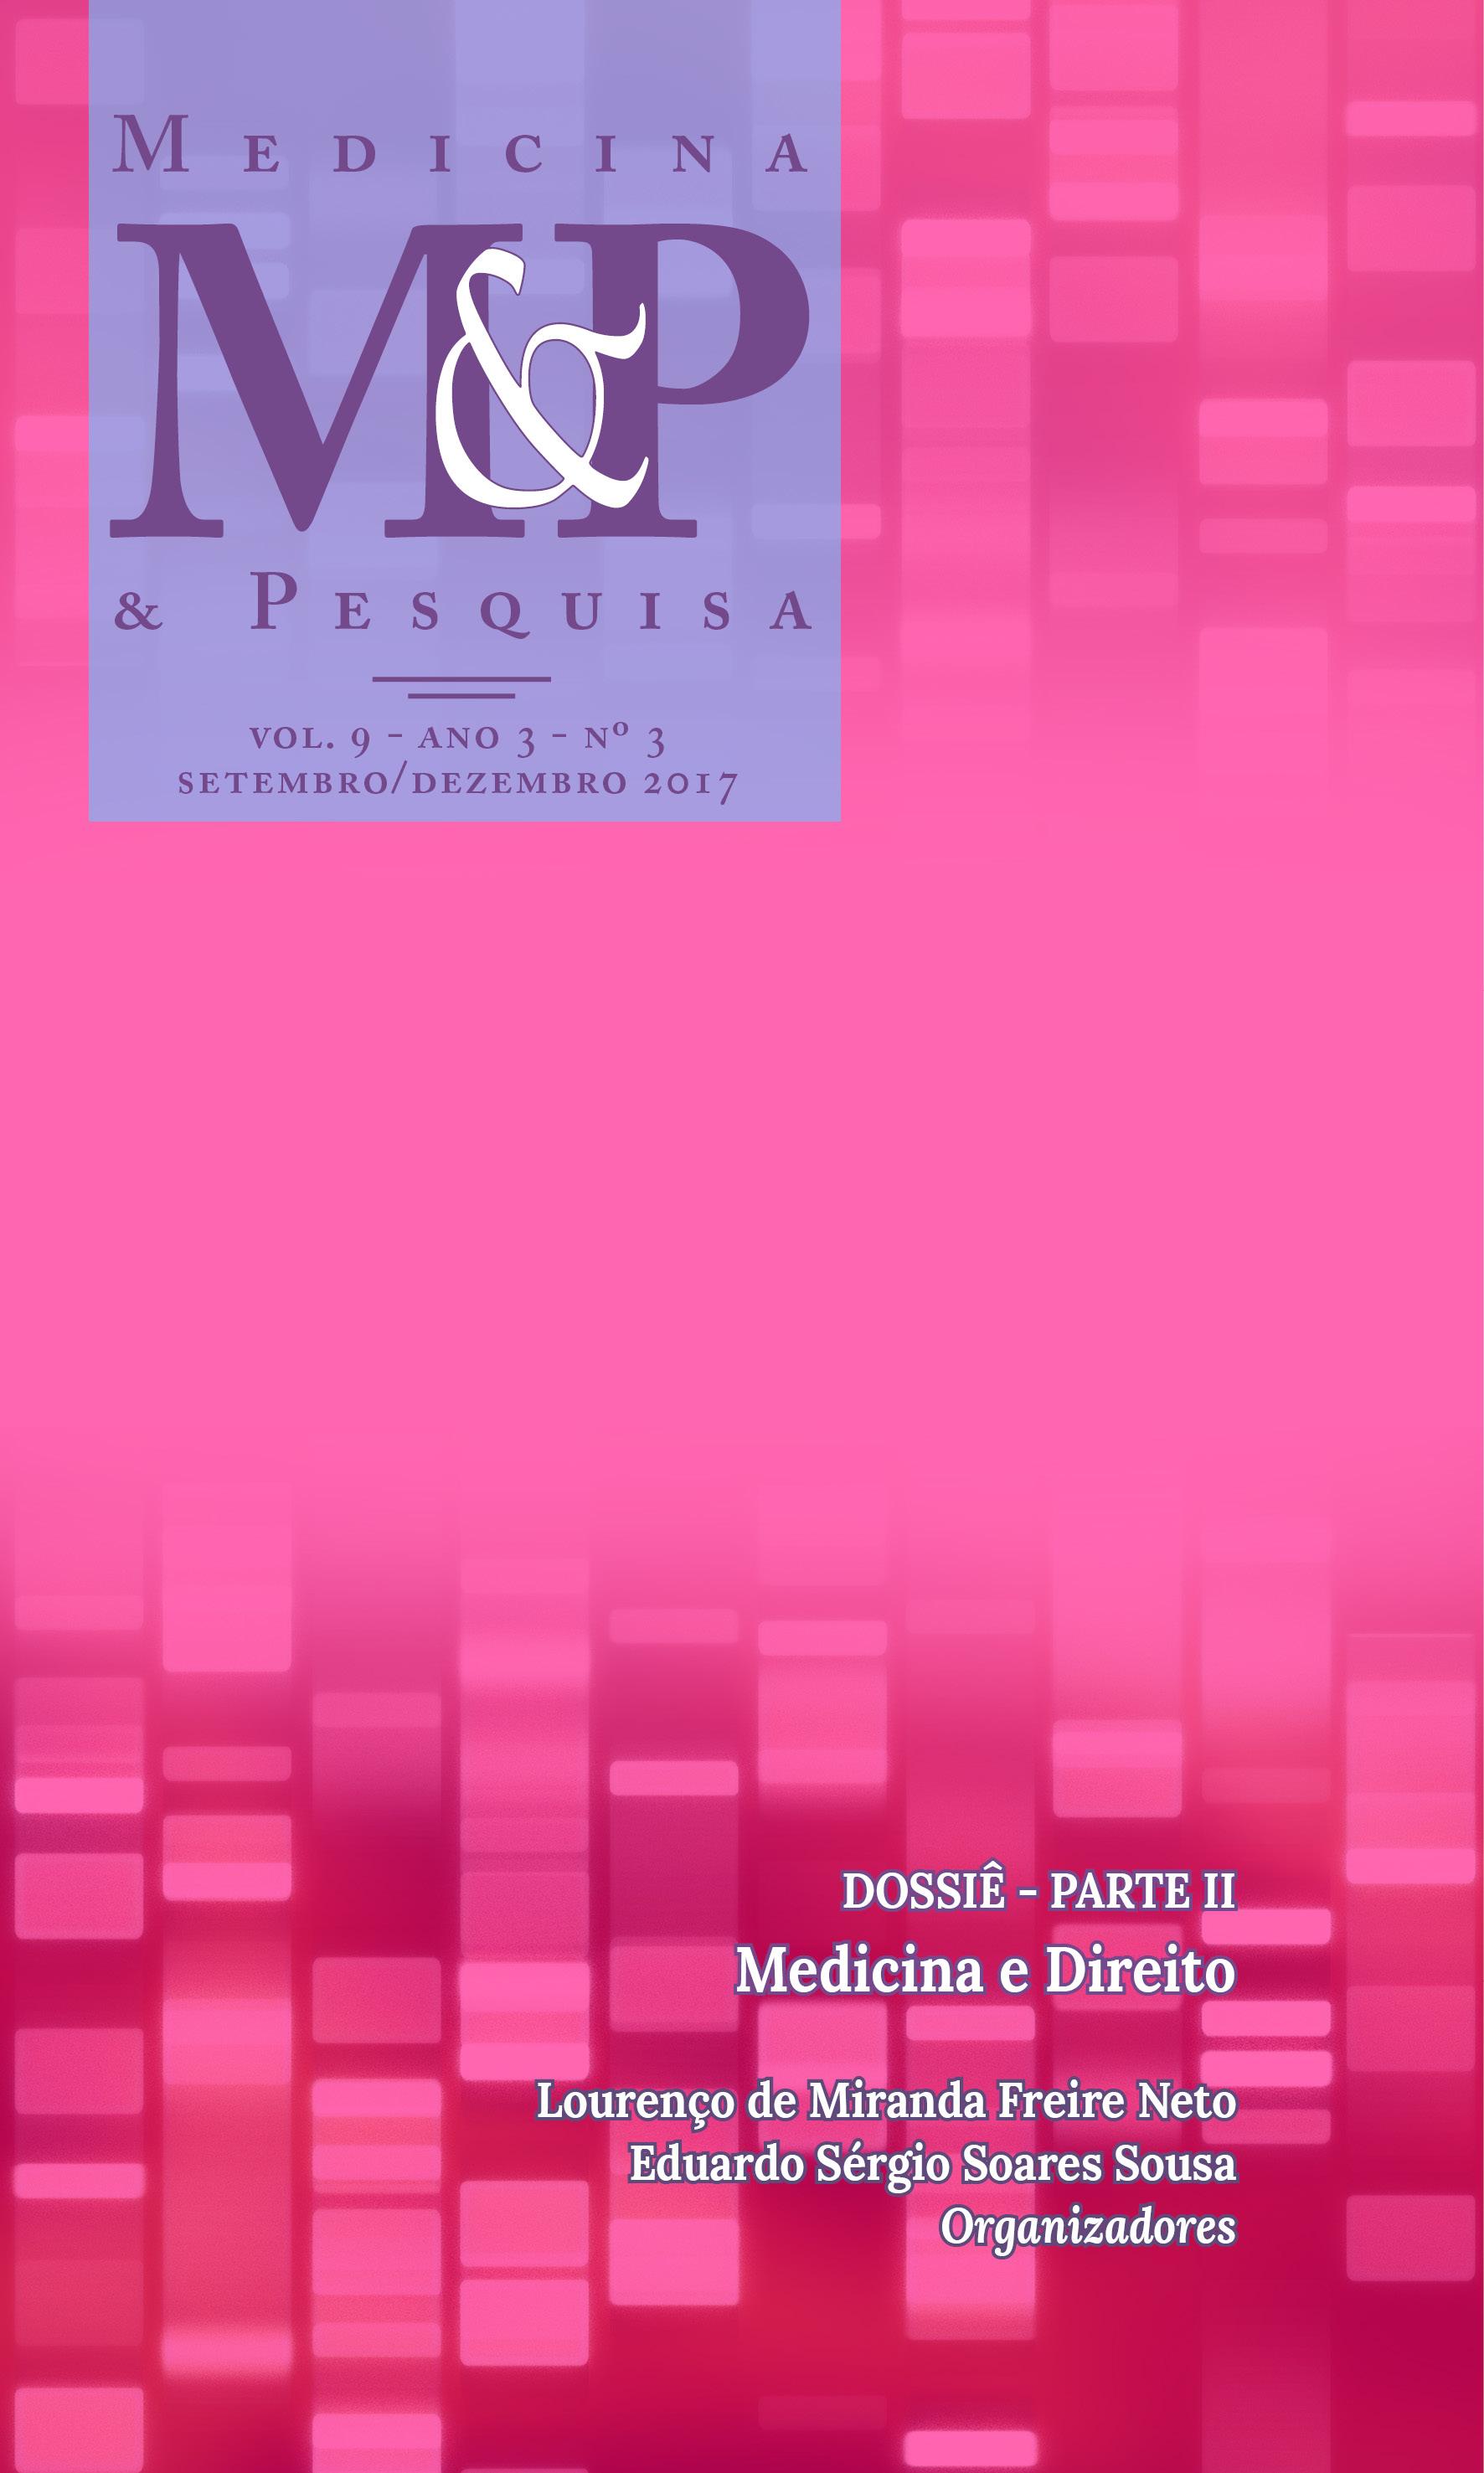 Visualizar v. 9 n. 3 (3): Medicina & Pesquisa - SETEMBRO/DEZEMBRO 2017